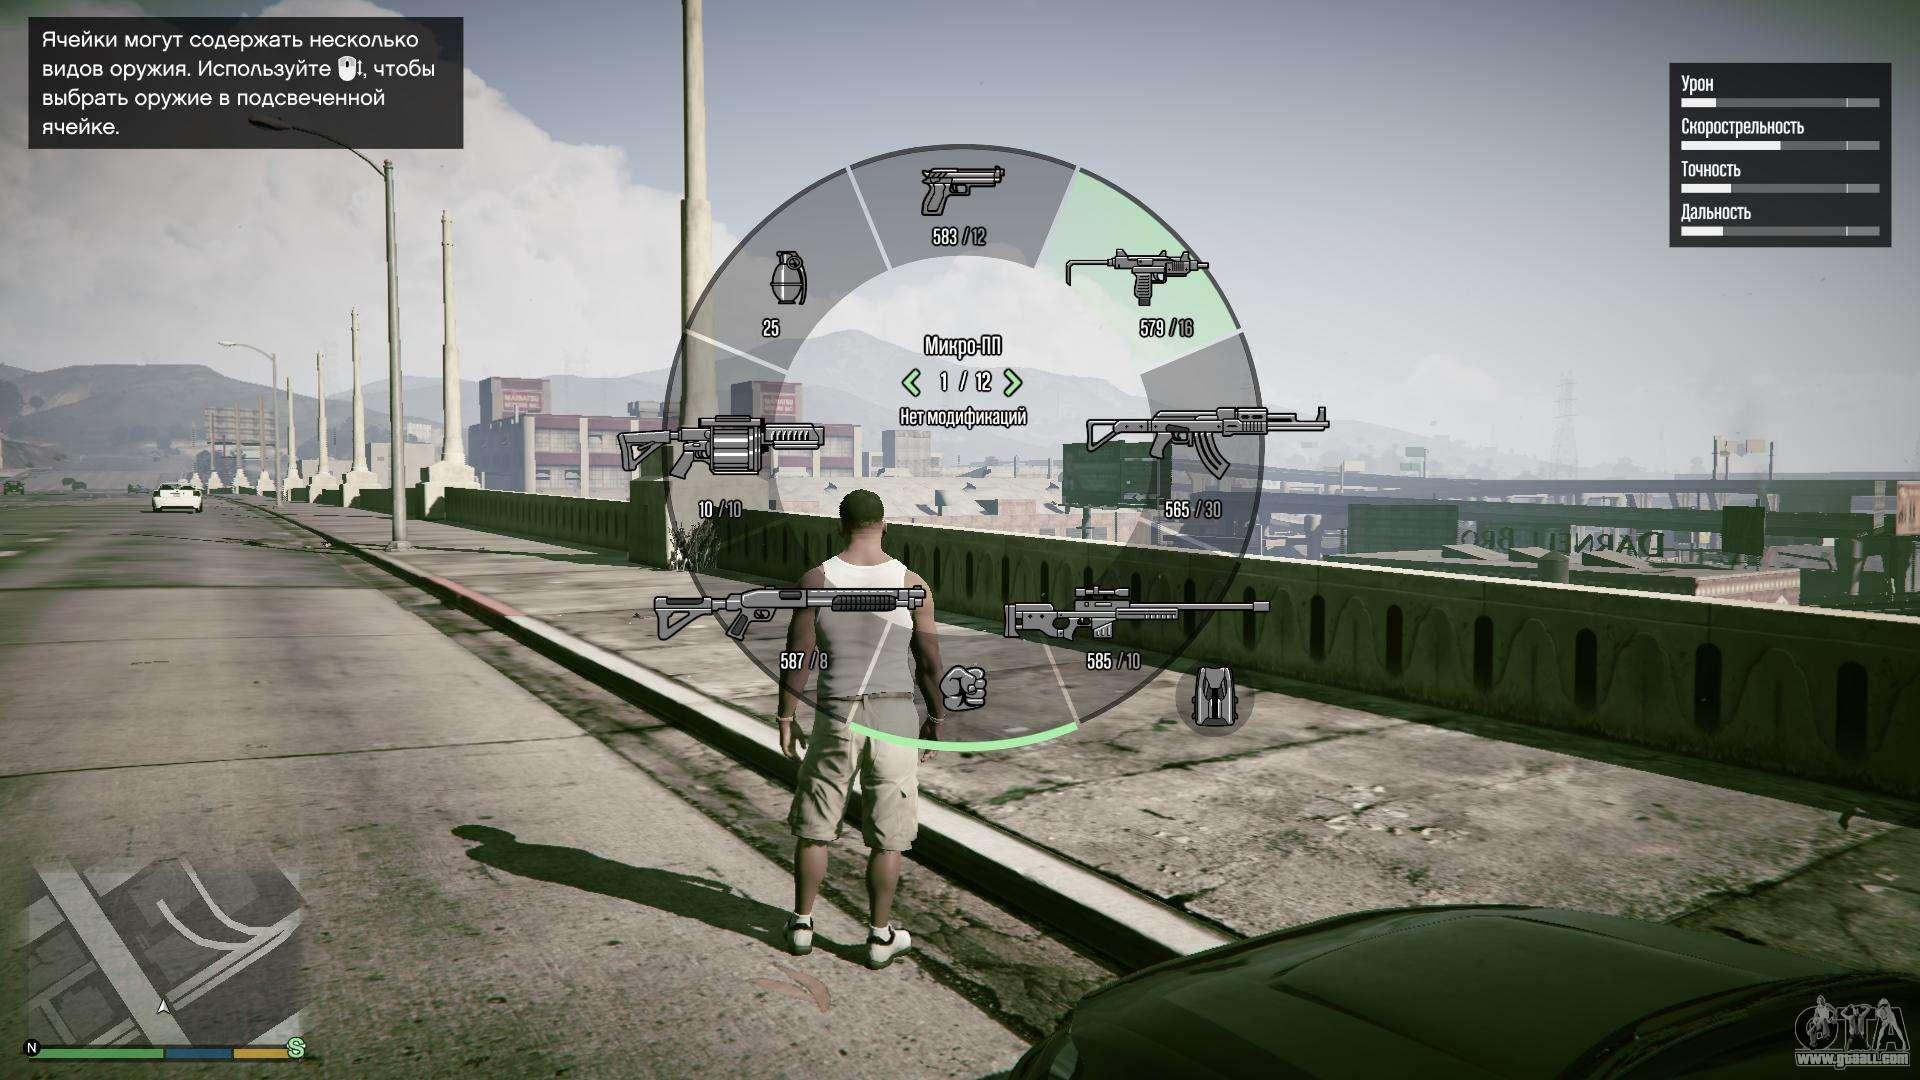 GTA 5 Crack [Game Fix] Direct Download [3DM] Latest Version 2021